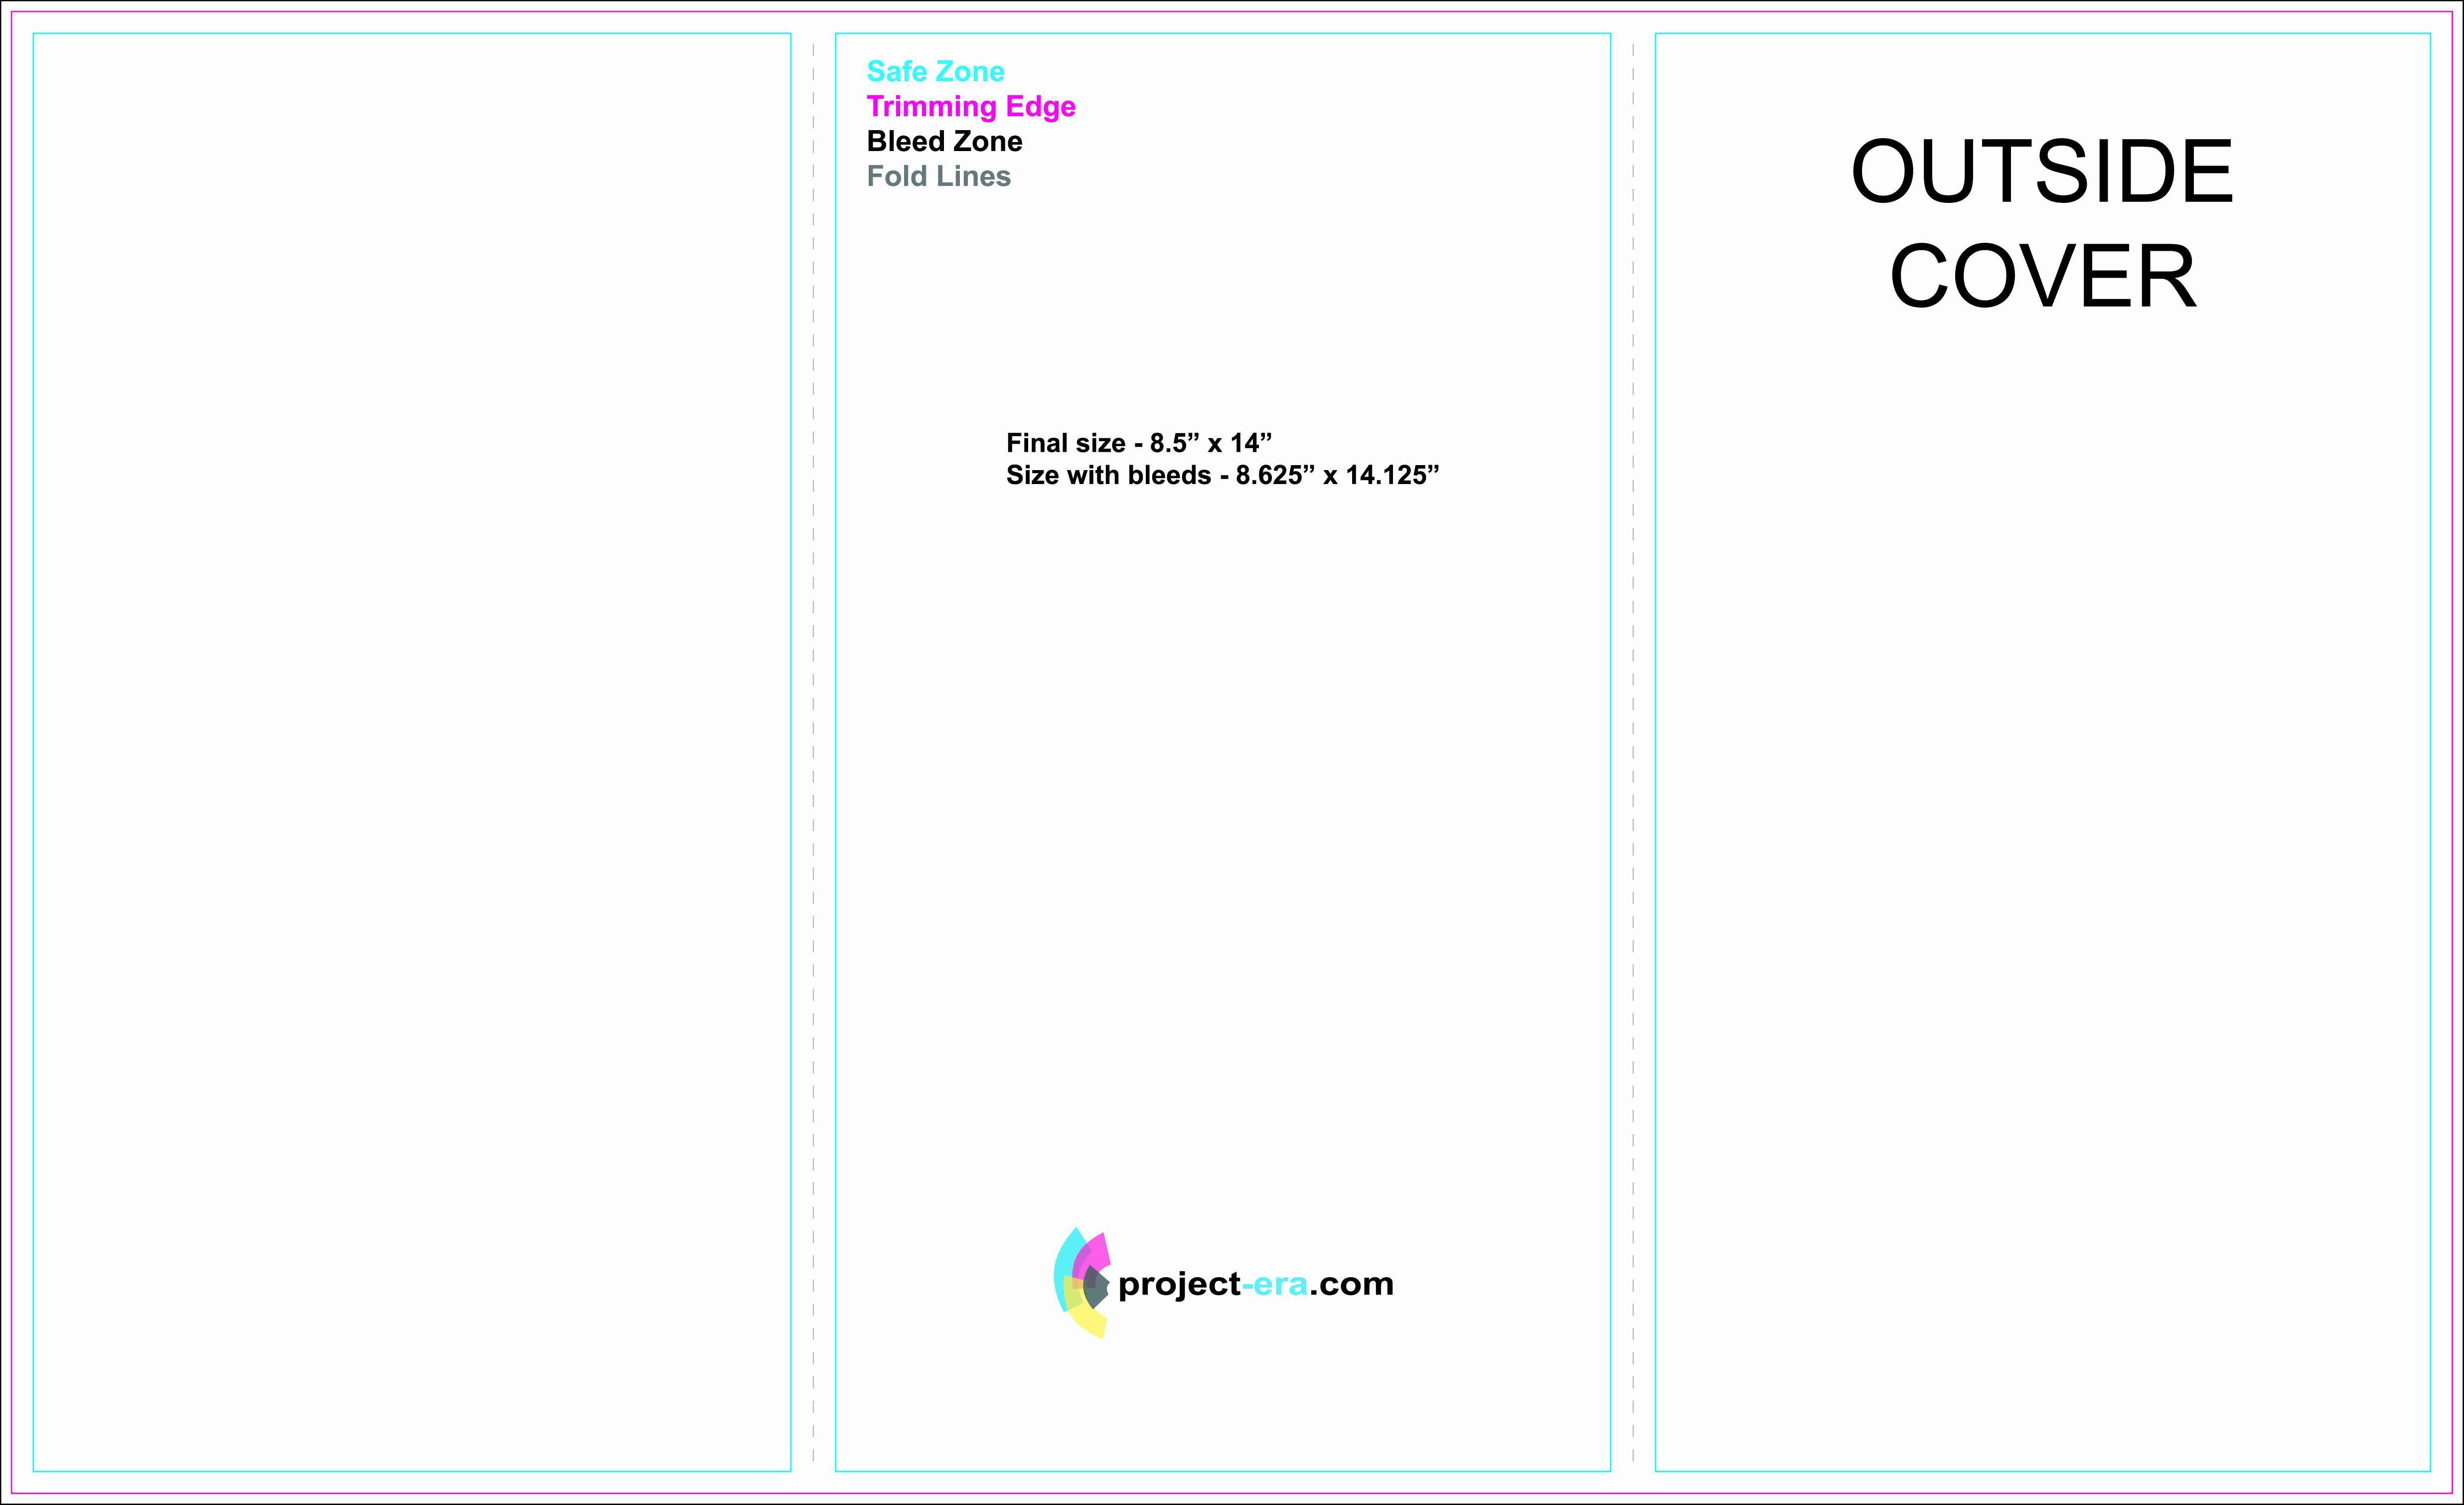 000 Wonderful 3 Fold Brochure Template Free Sample  Word DownloadFull